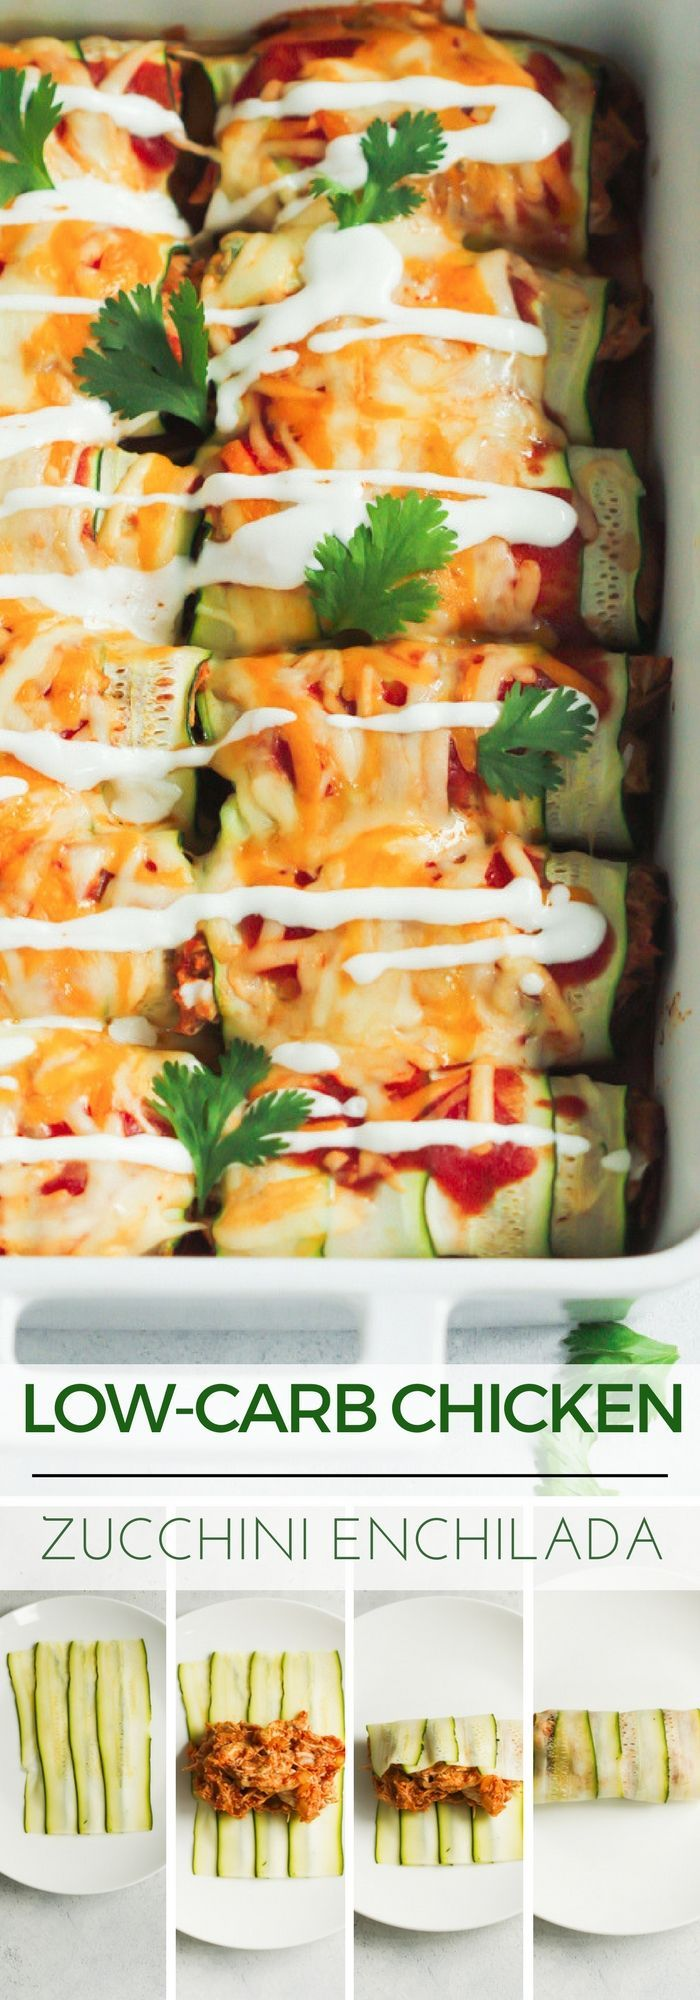 Lowcarb Chicken Zucchini Enchilada